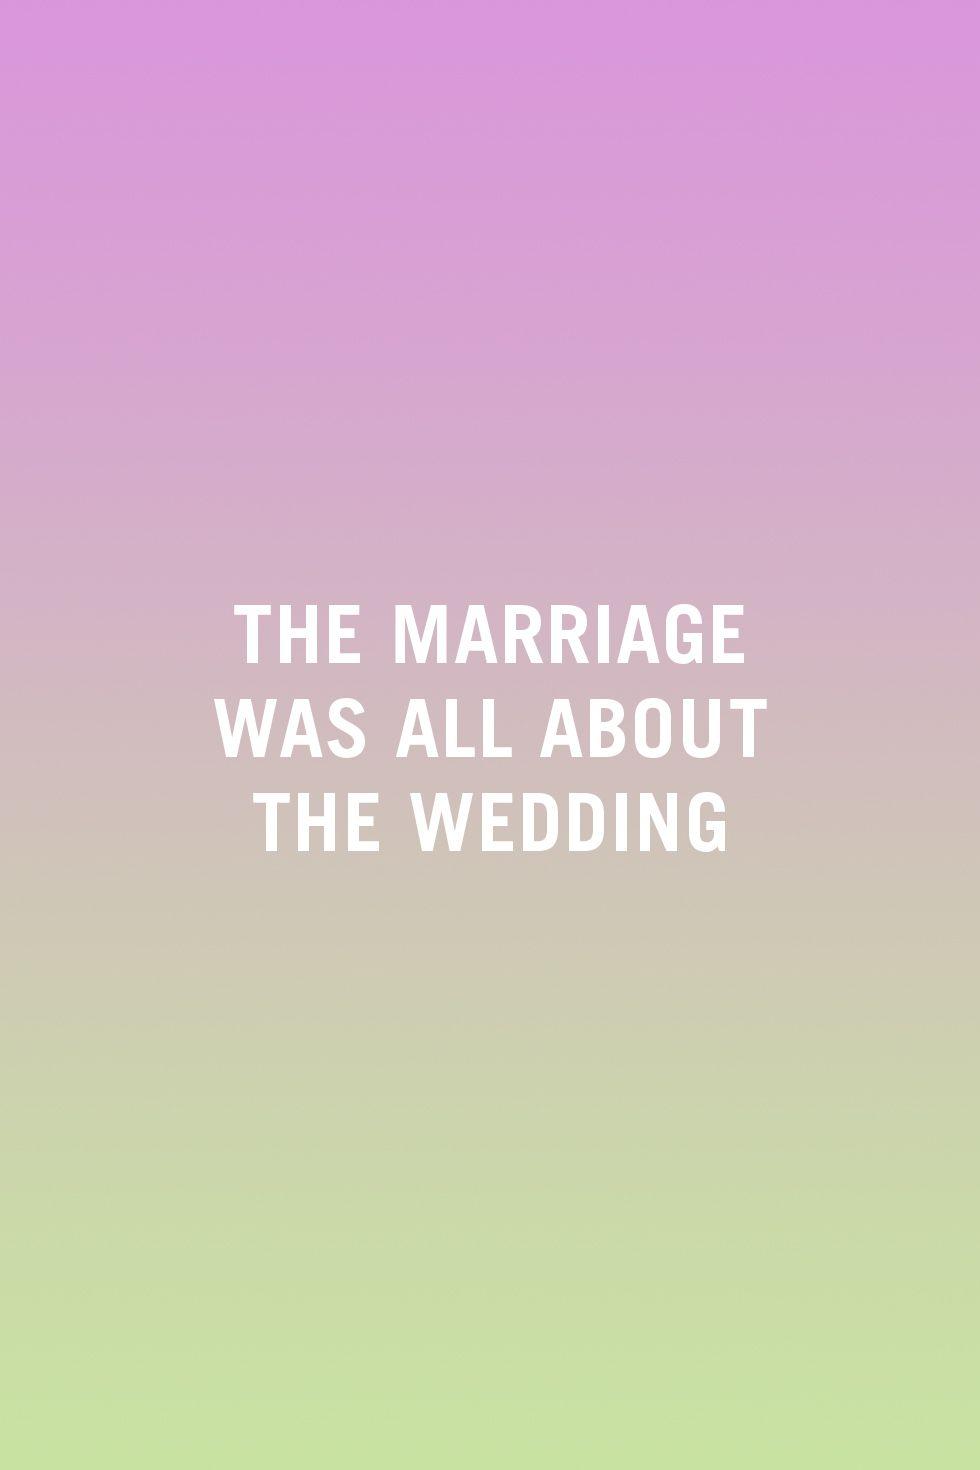 Reconnecting when marital drift sets